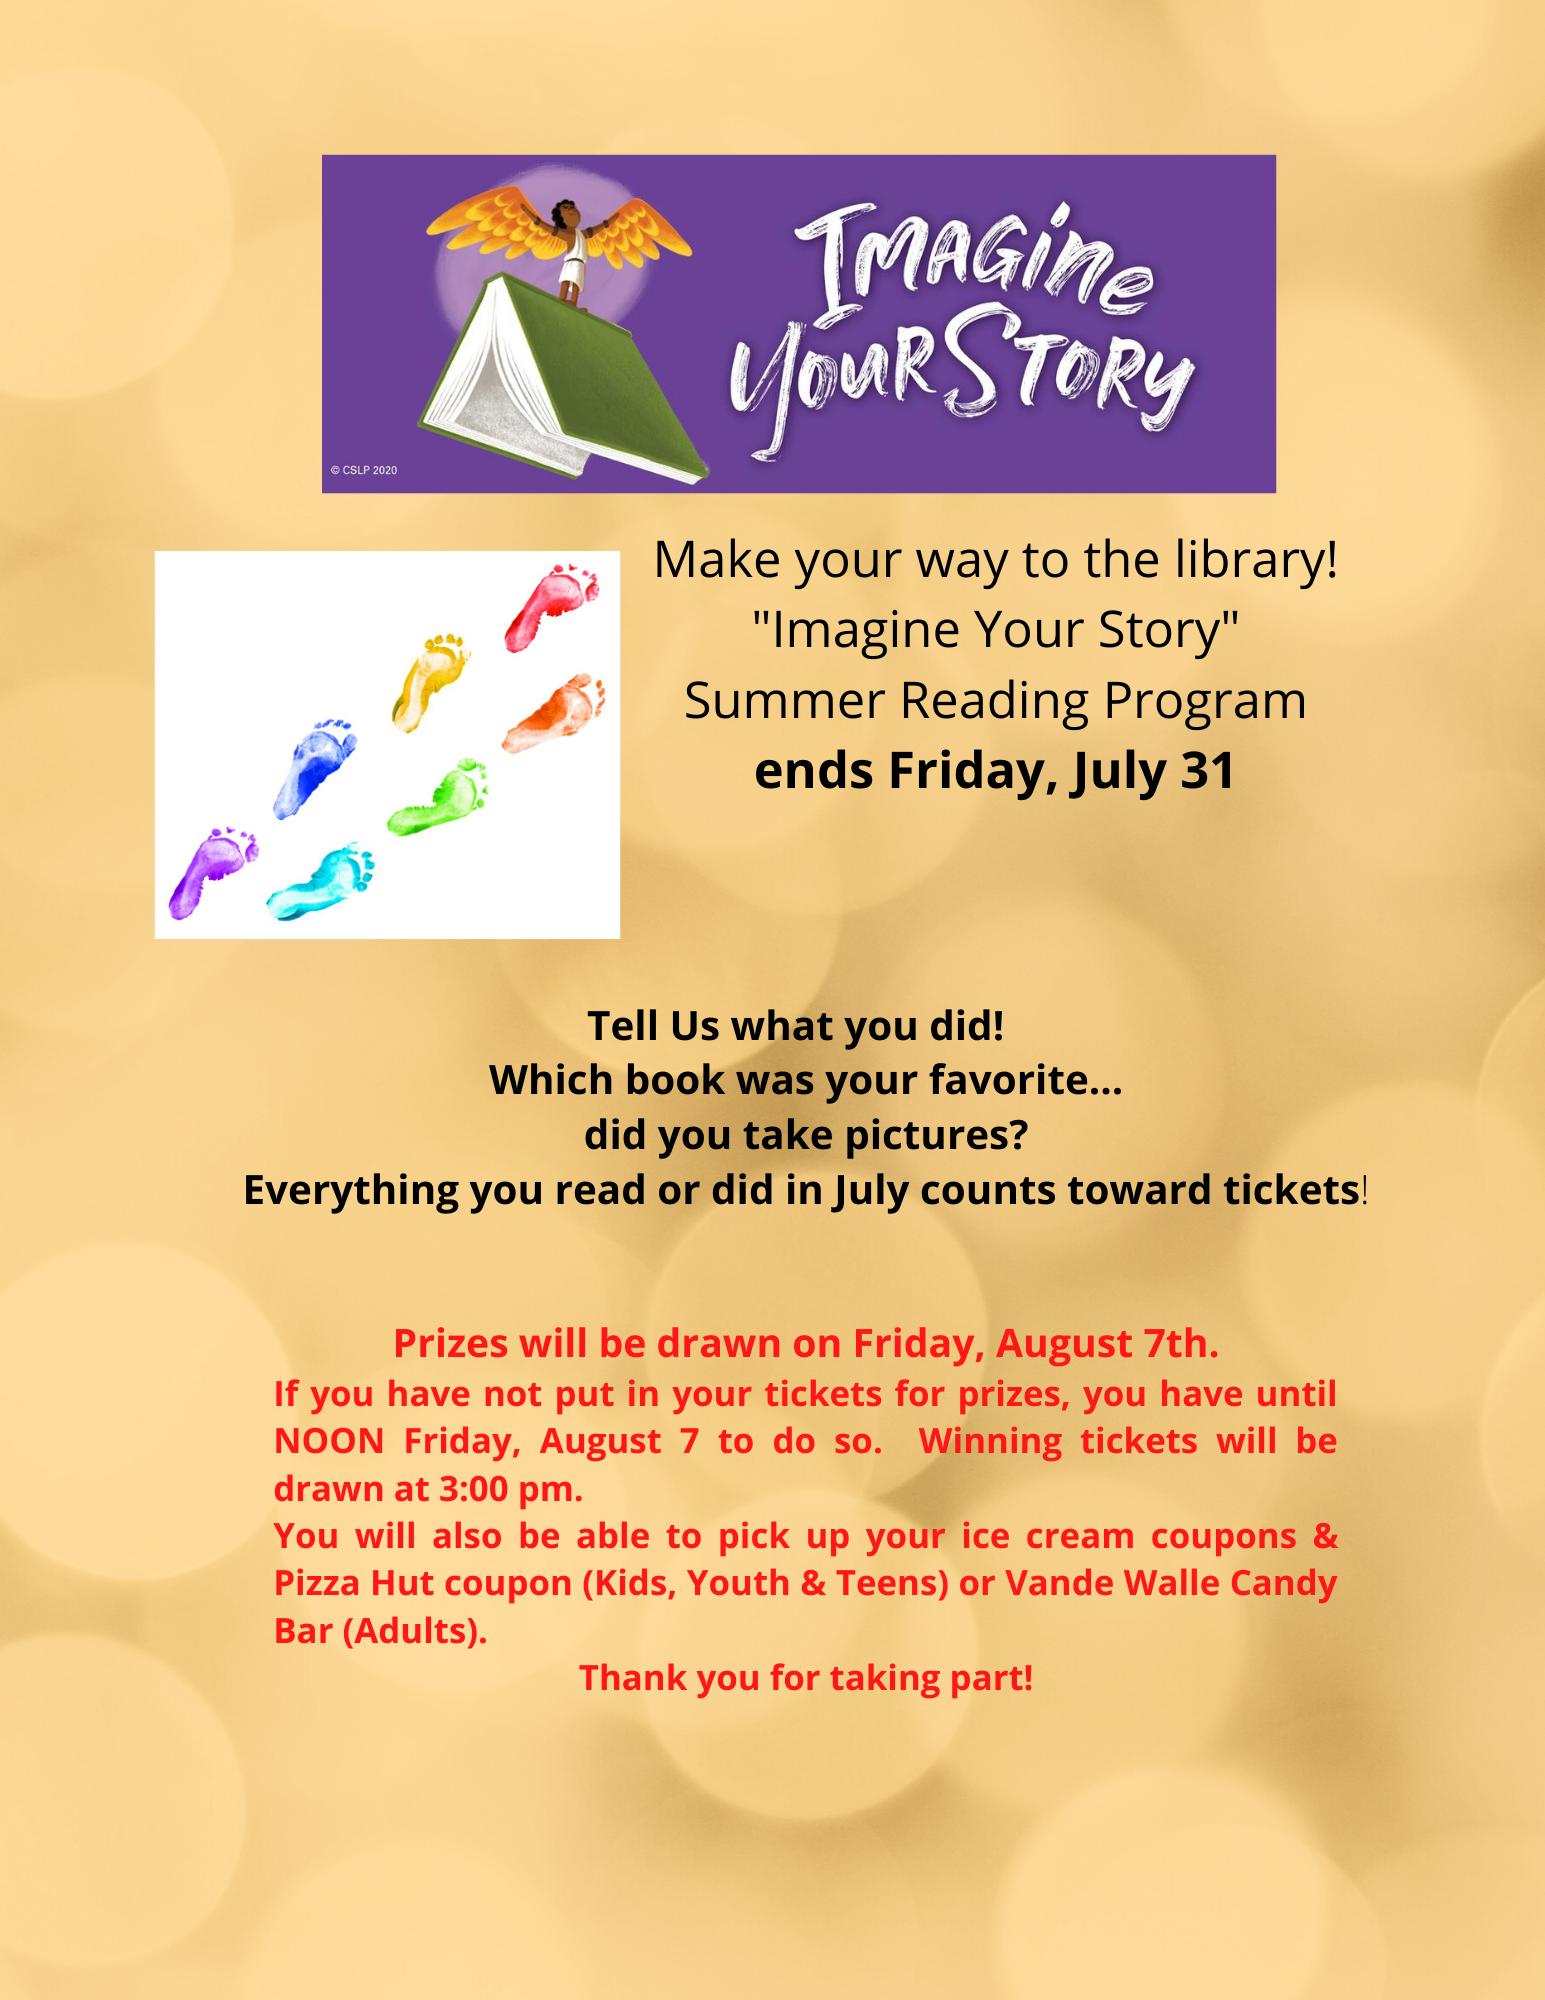 Summer Reading Program Ends July 31